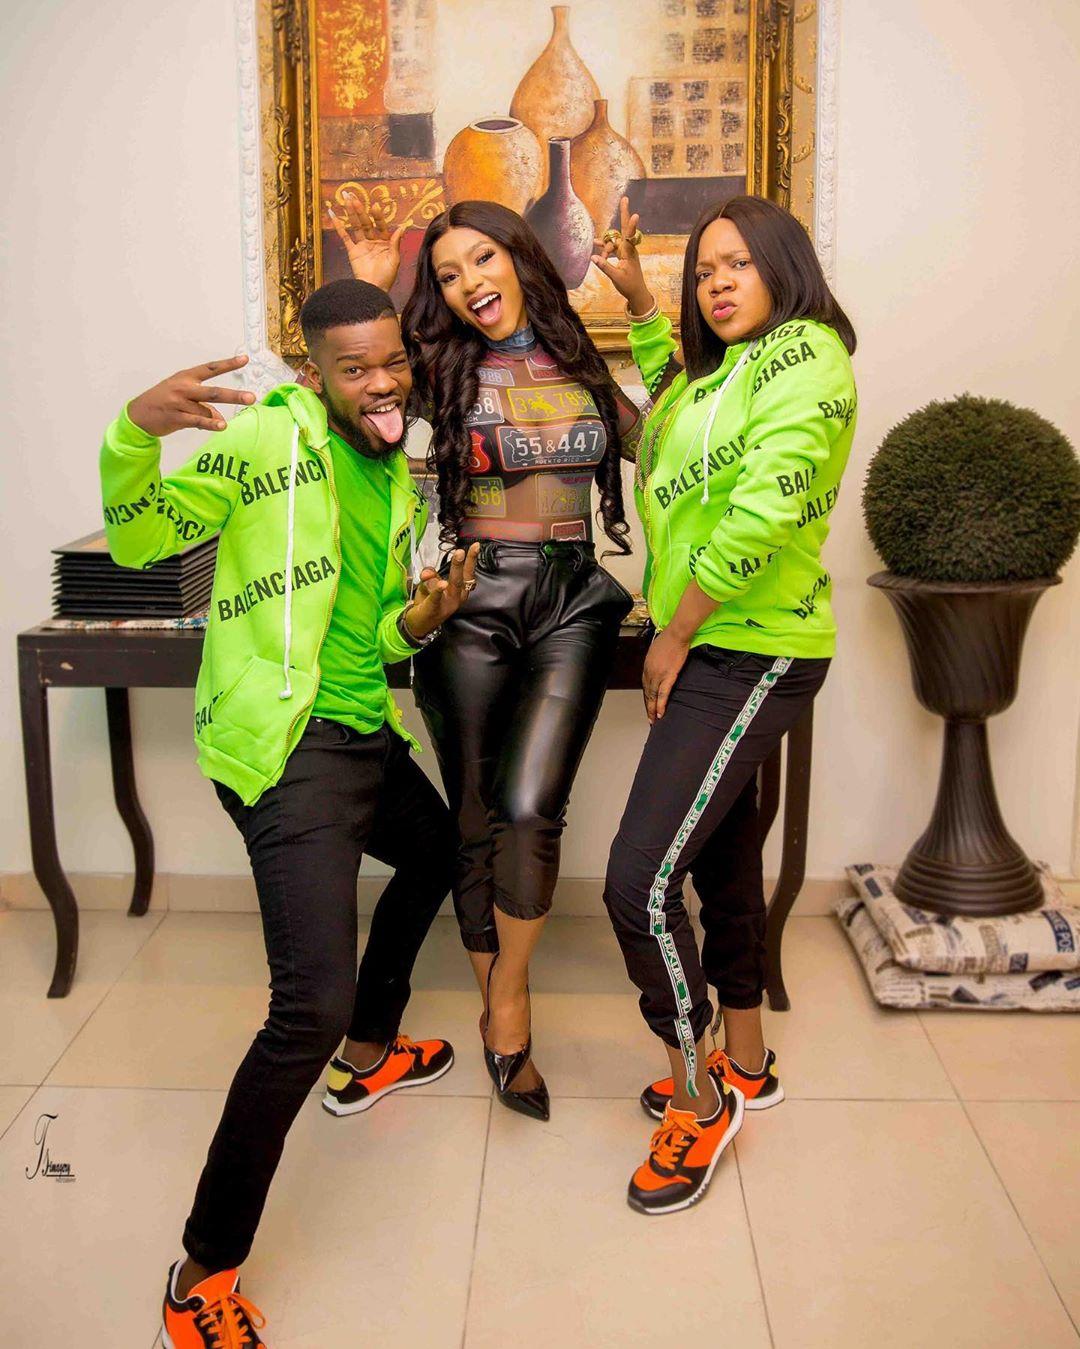 When Will Big Brother Naija 2020 Start - Big Brother 2020